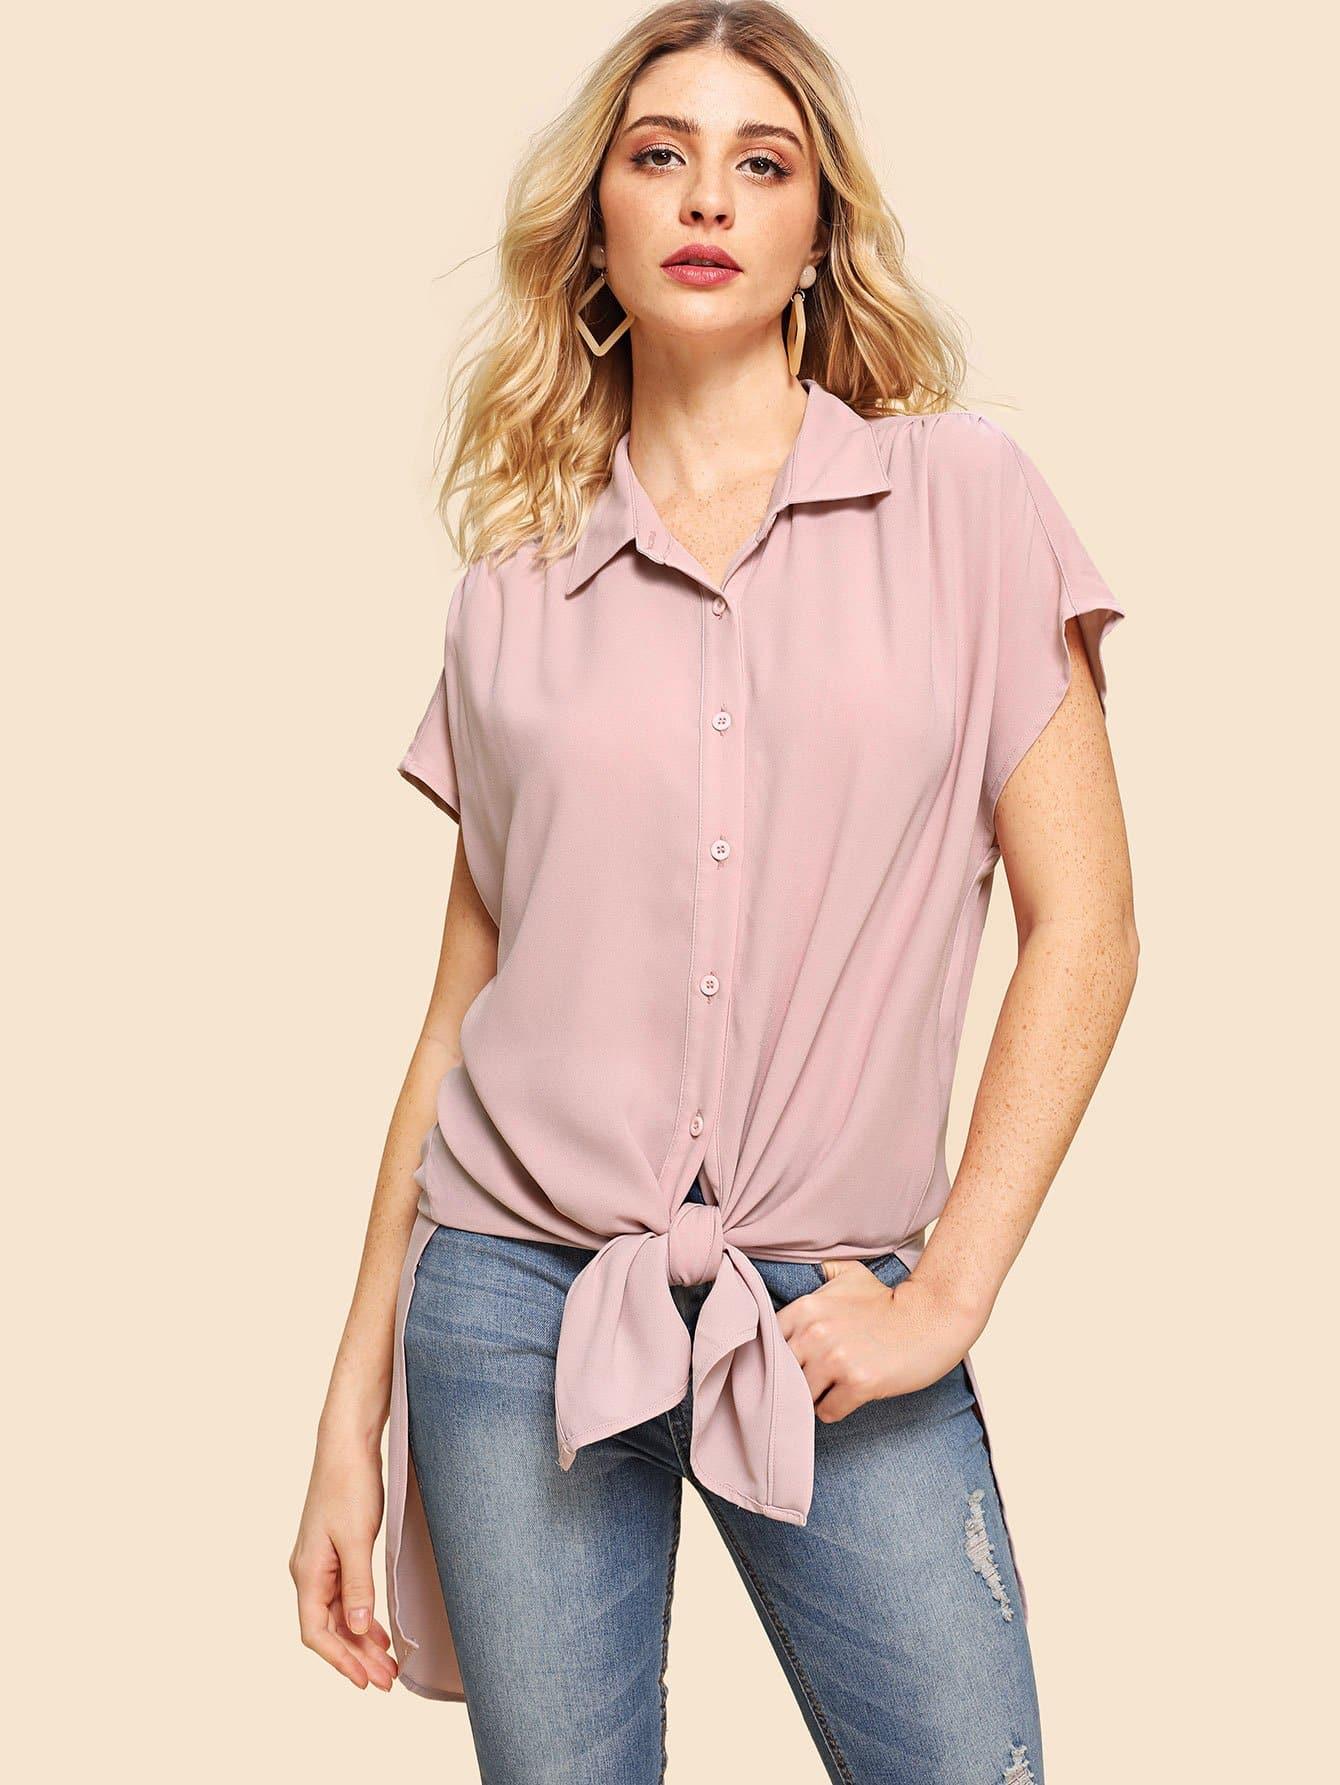 Купить Slit Curved Dip Hem Knotted Shirt, Nathane, SheIn